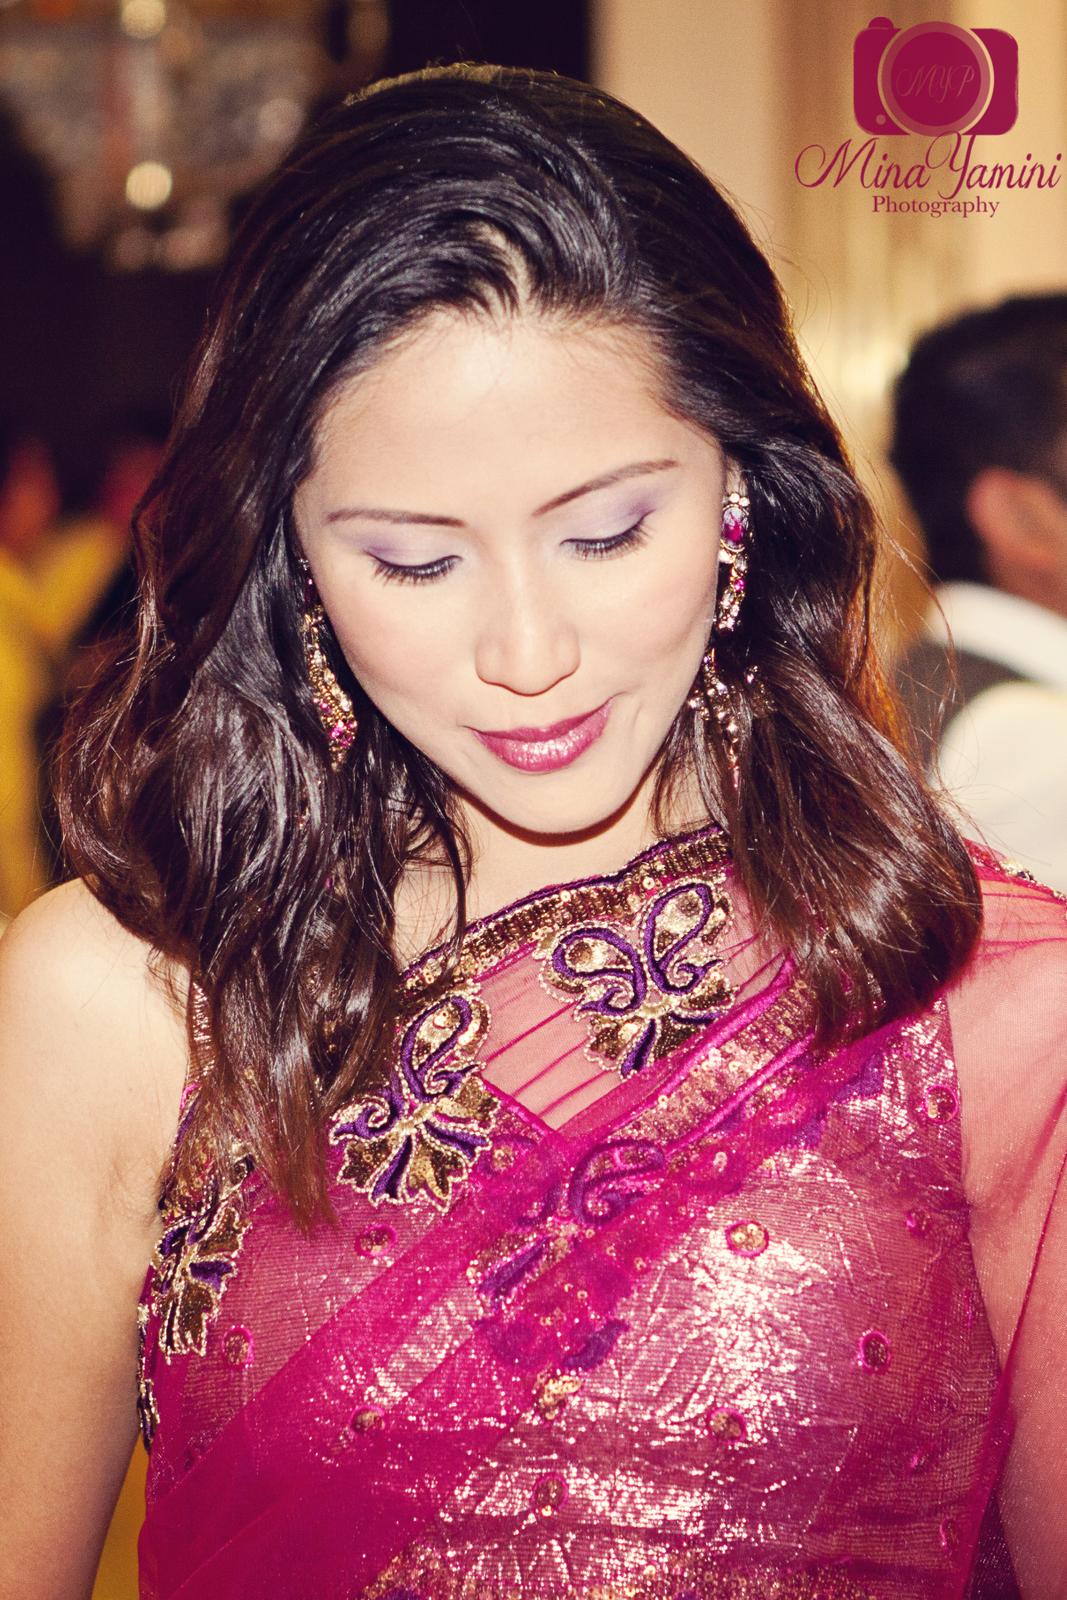 Indian Wedding – Dubai Wedding Photographer | Our Adventures In The ...